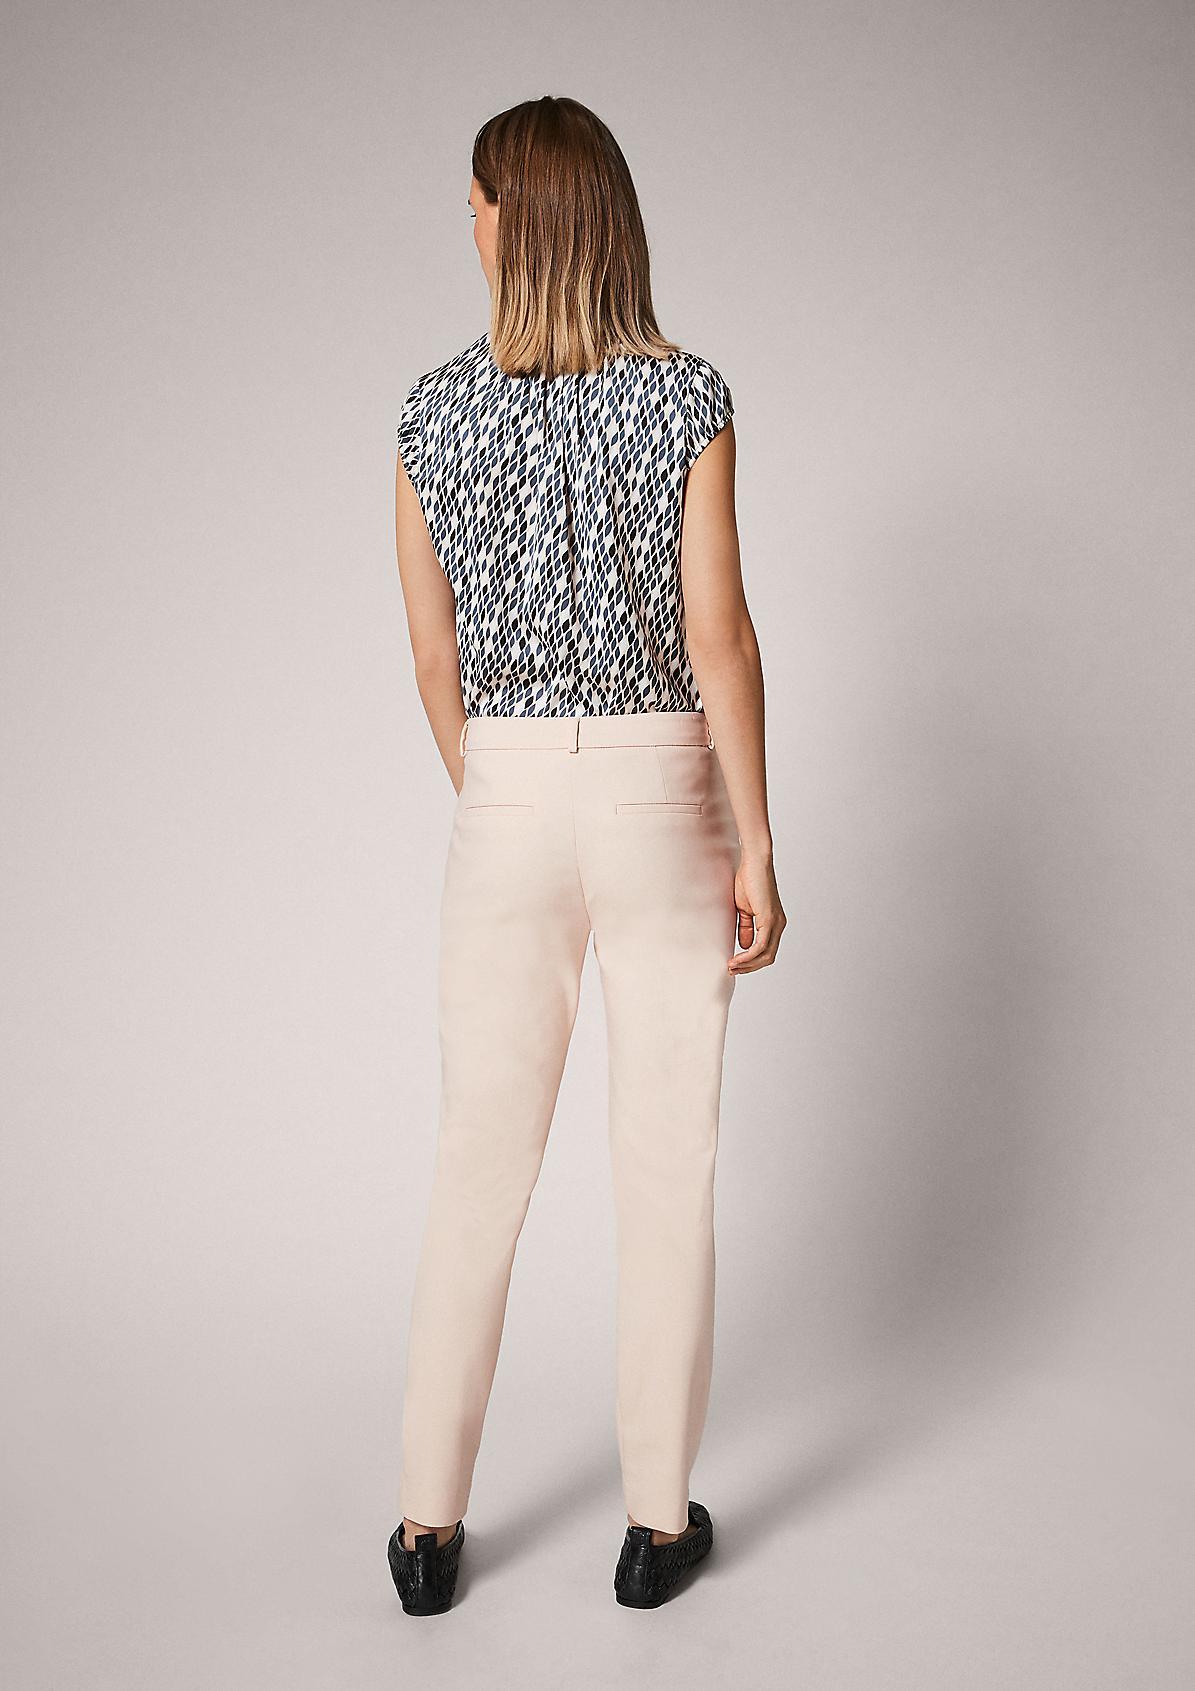 Regular Fit: Slim leg-Hose im eleganten Look